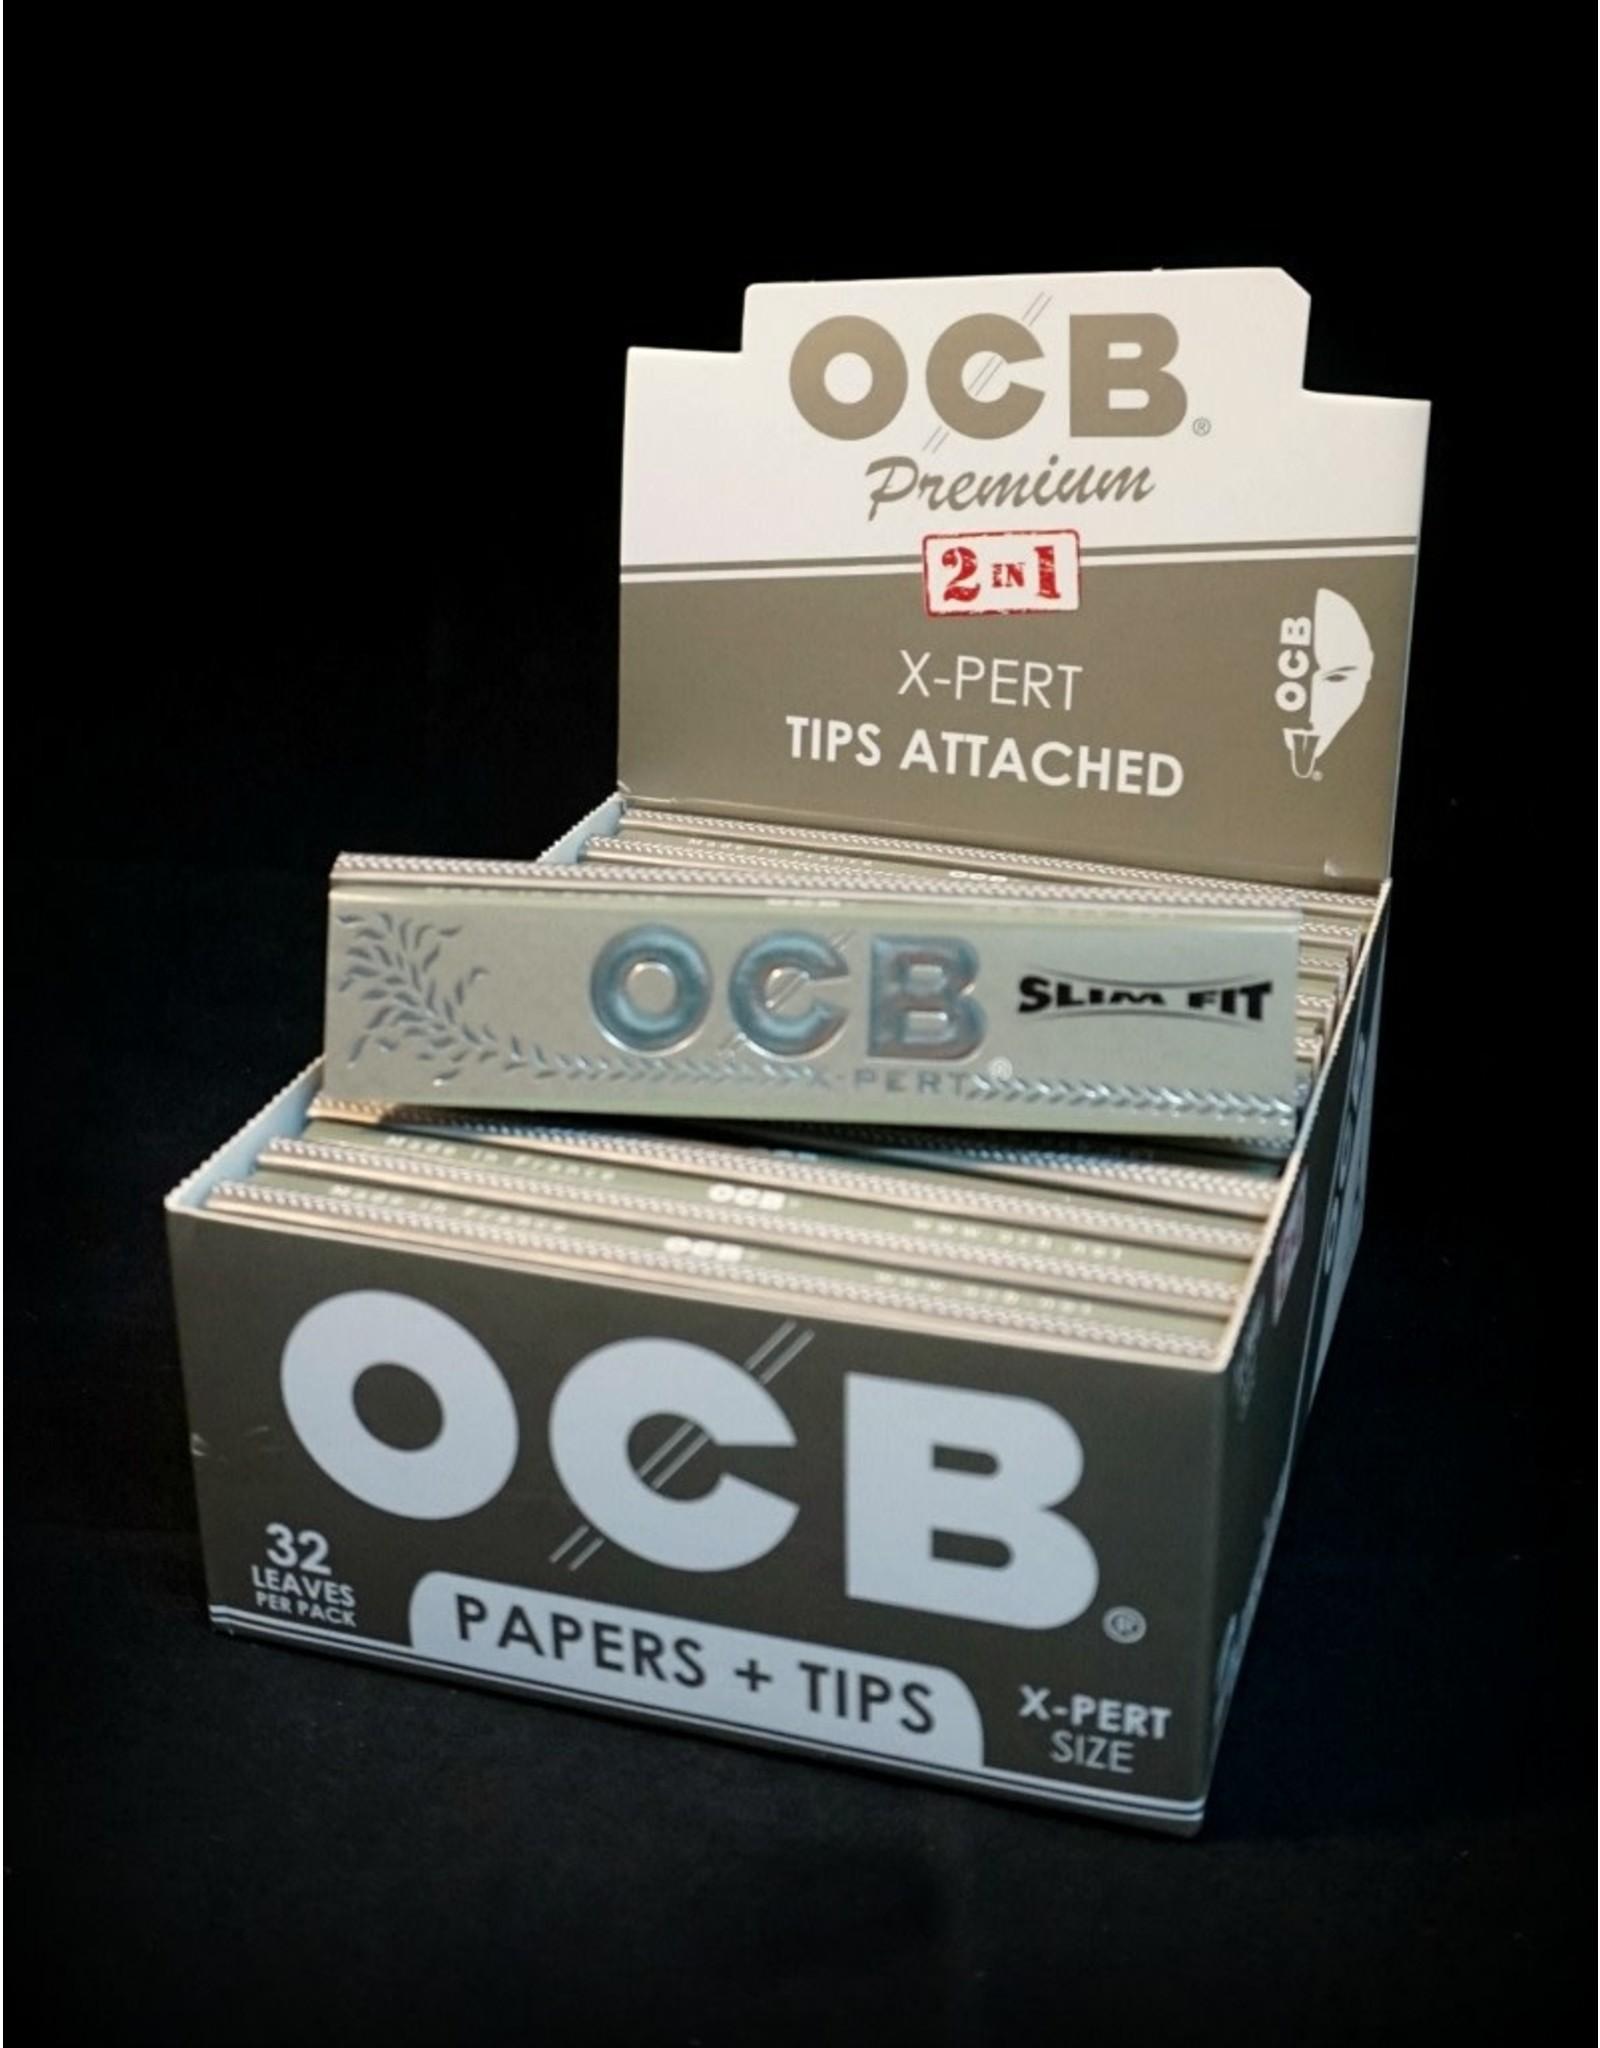 OCB OCB Xpert Papers